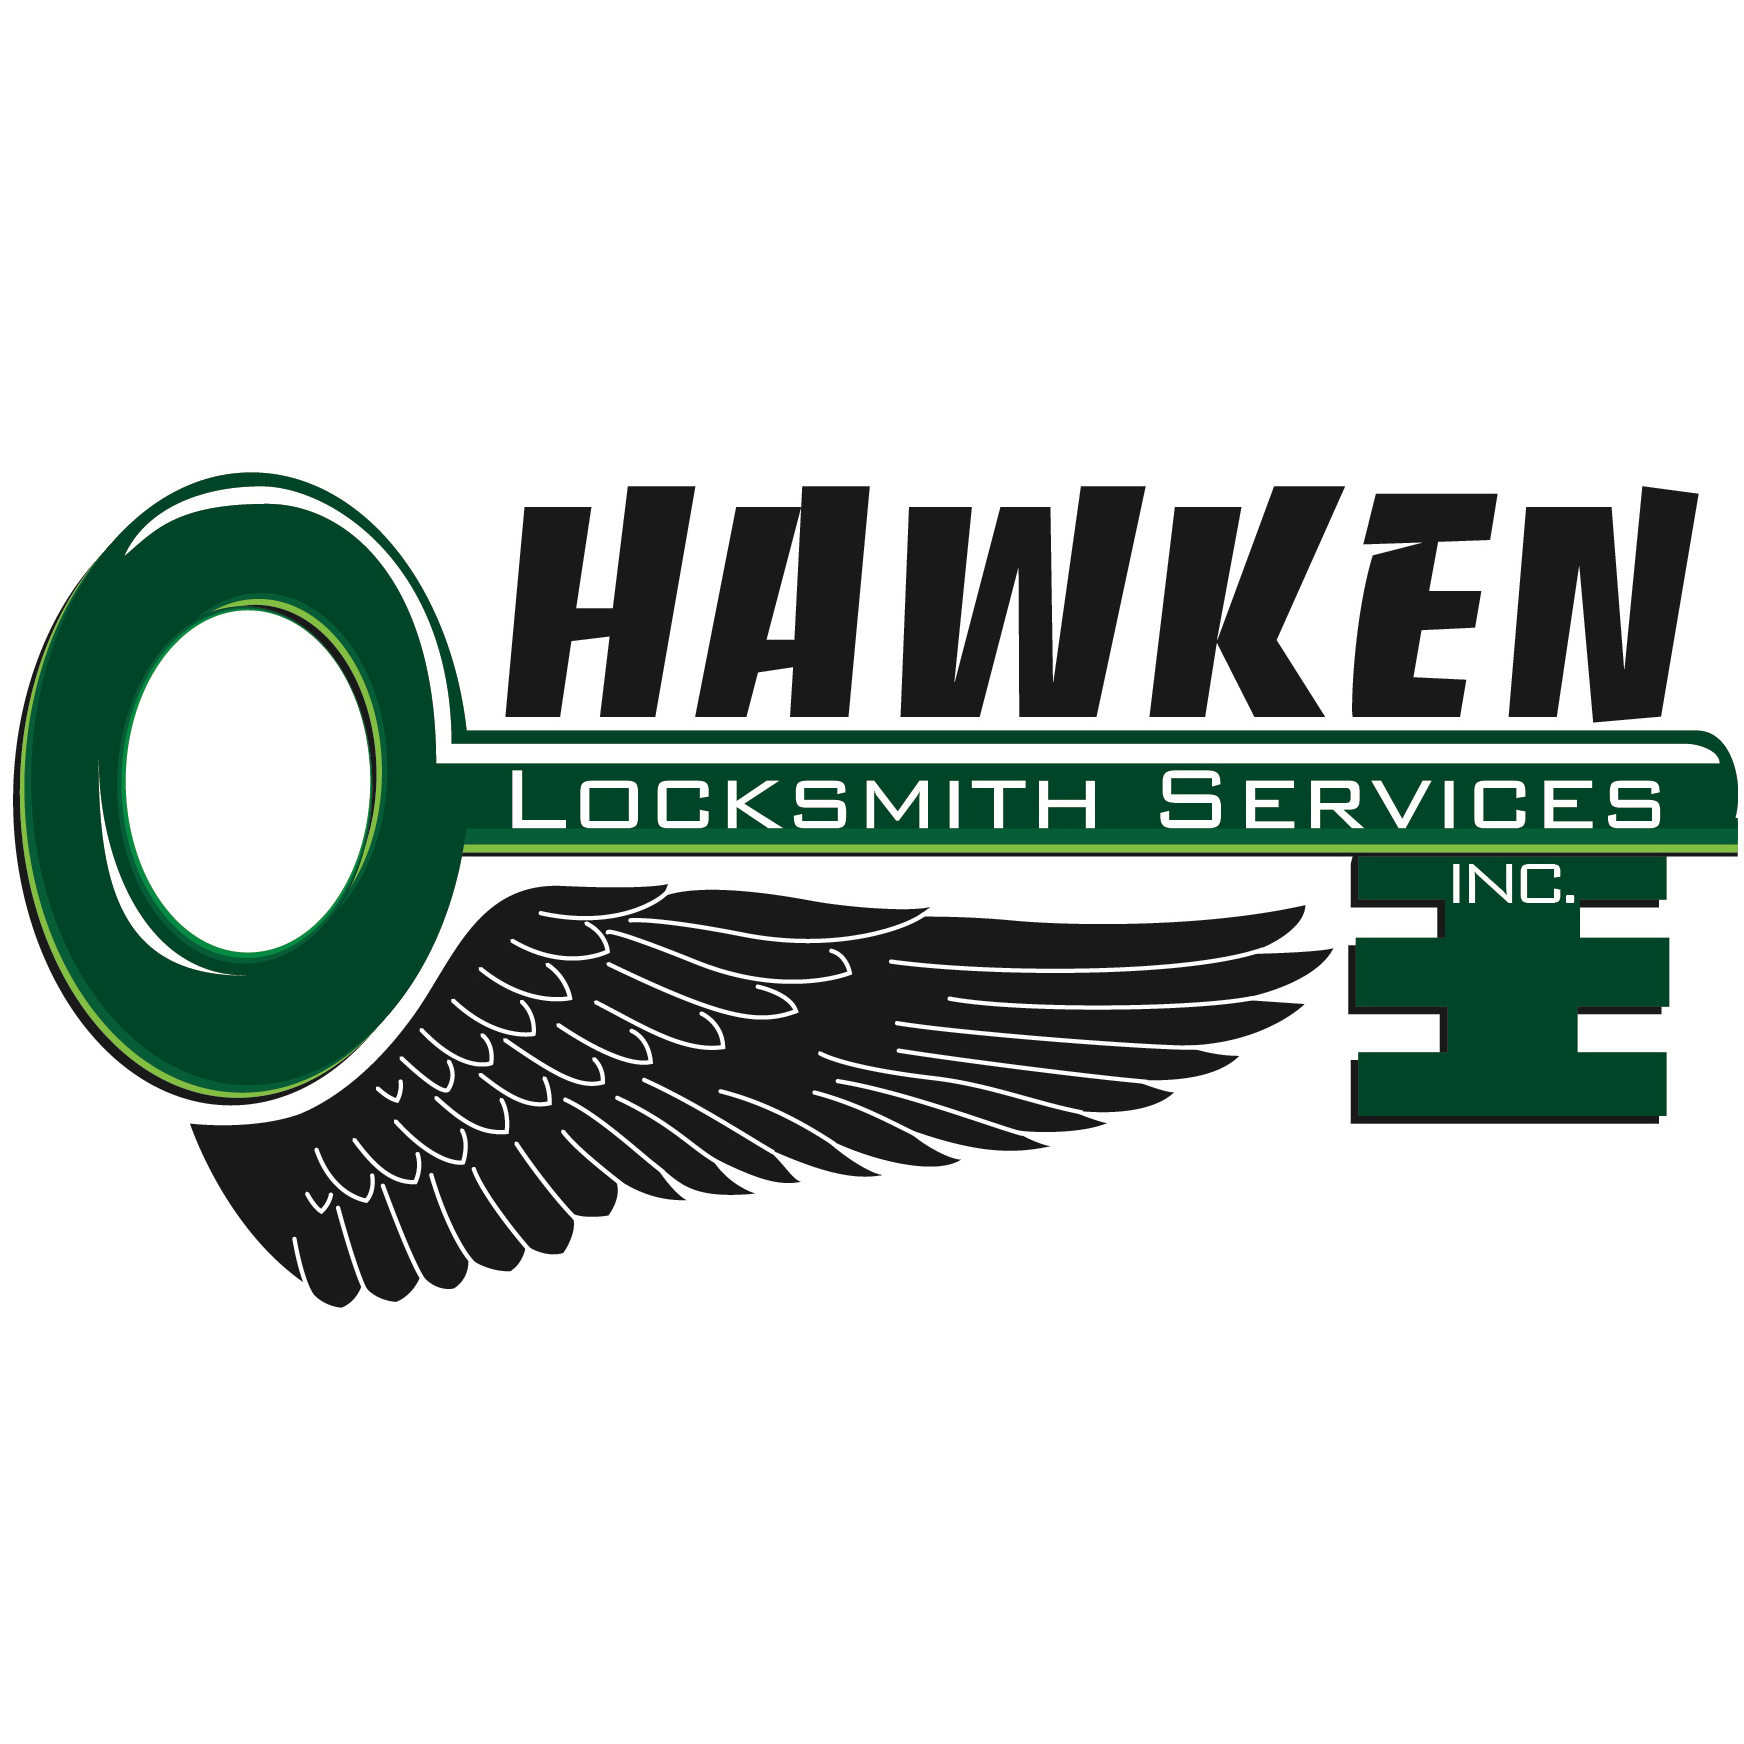 Hawken Locksmith Services Inc. Logo